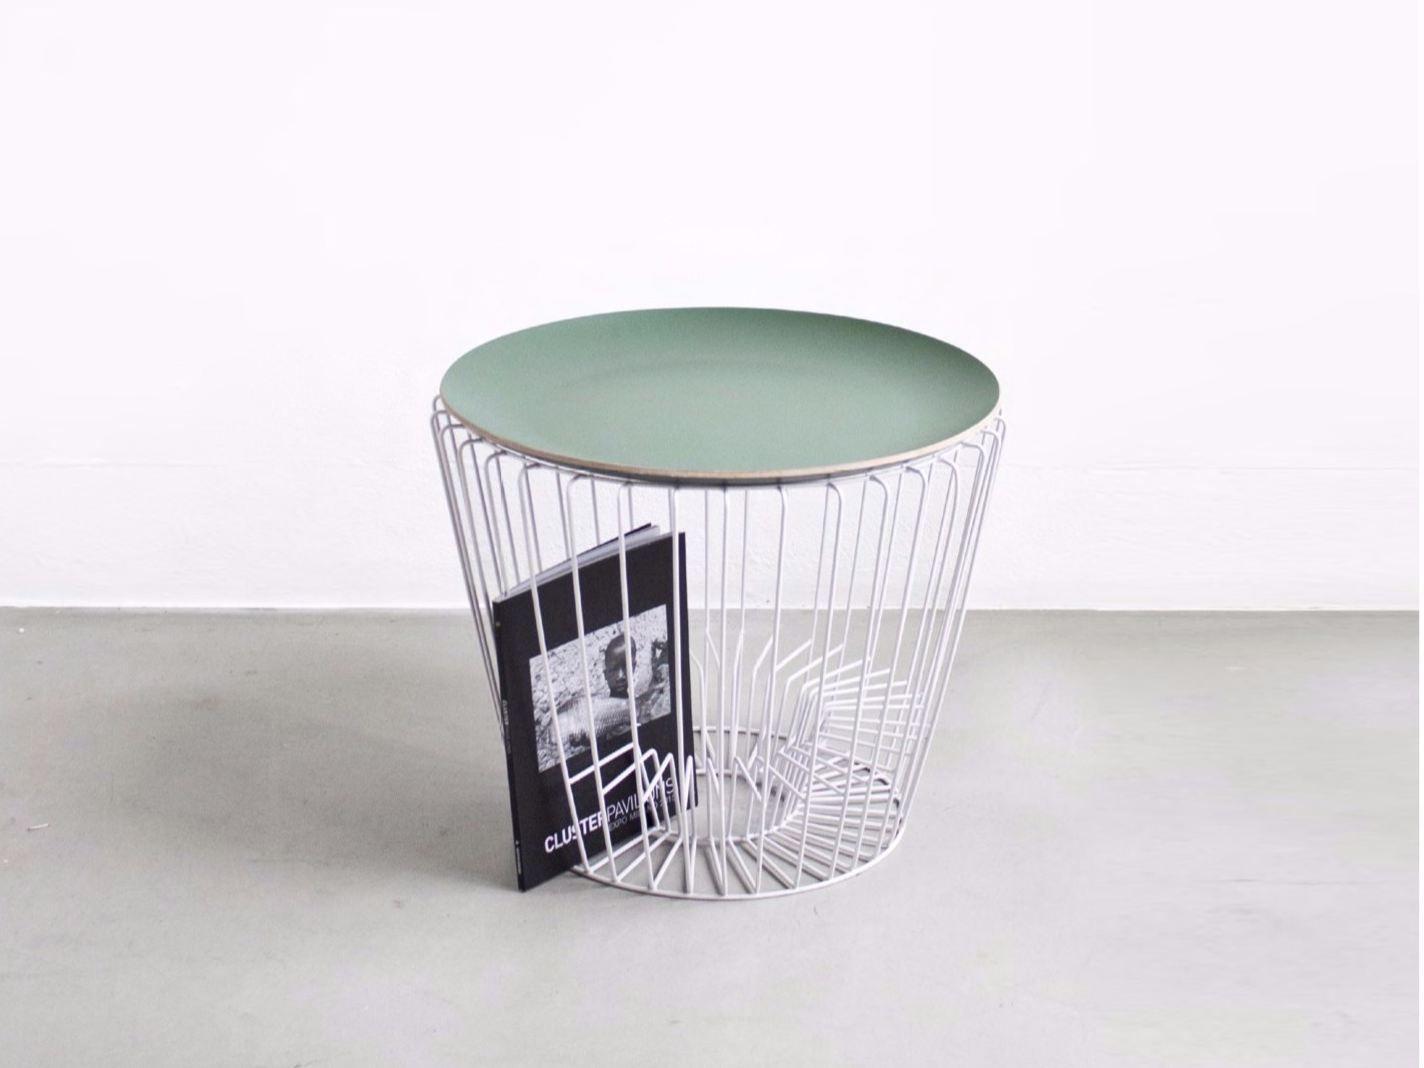 Mobilia design coffee and side tables - Buy Online Coffee Table By Comingb Round Side Table With Integrated Magazine Rack Design Comingb